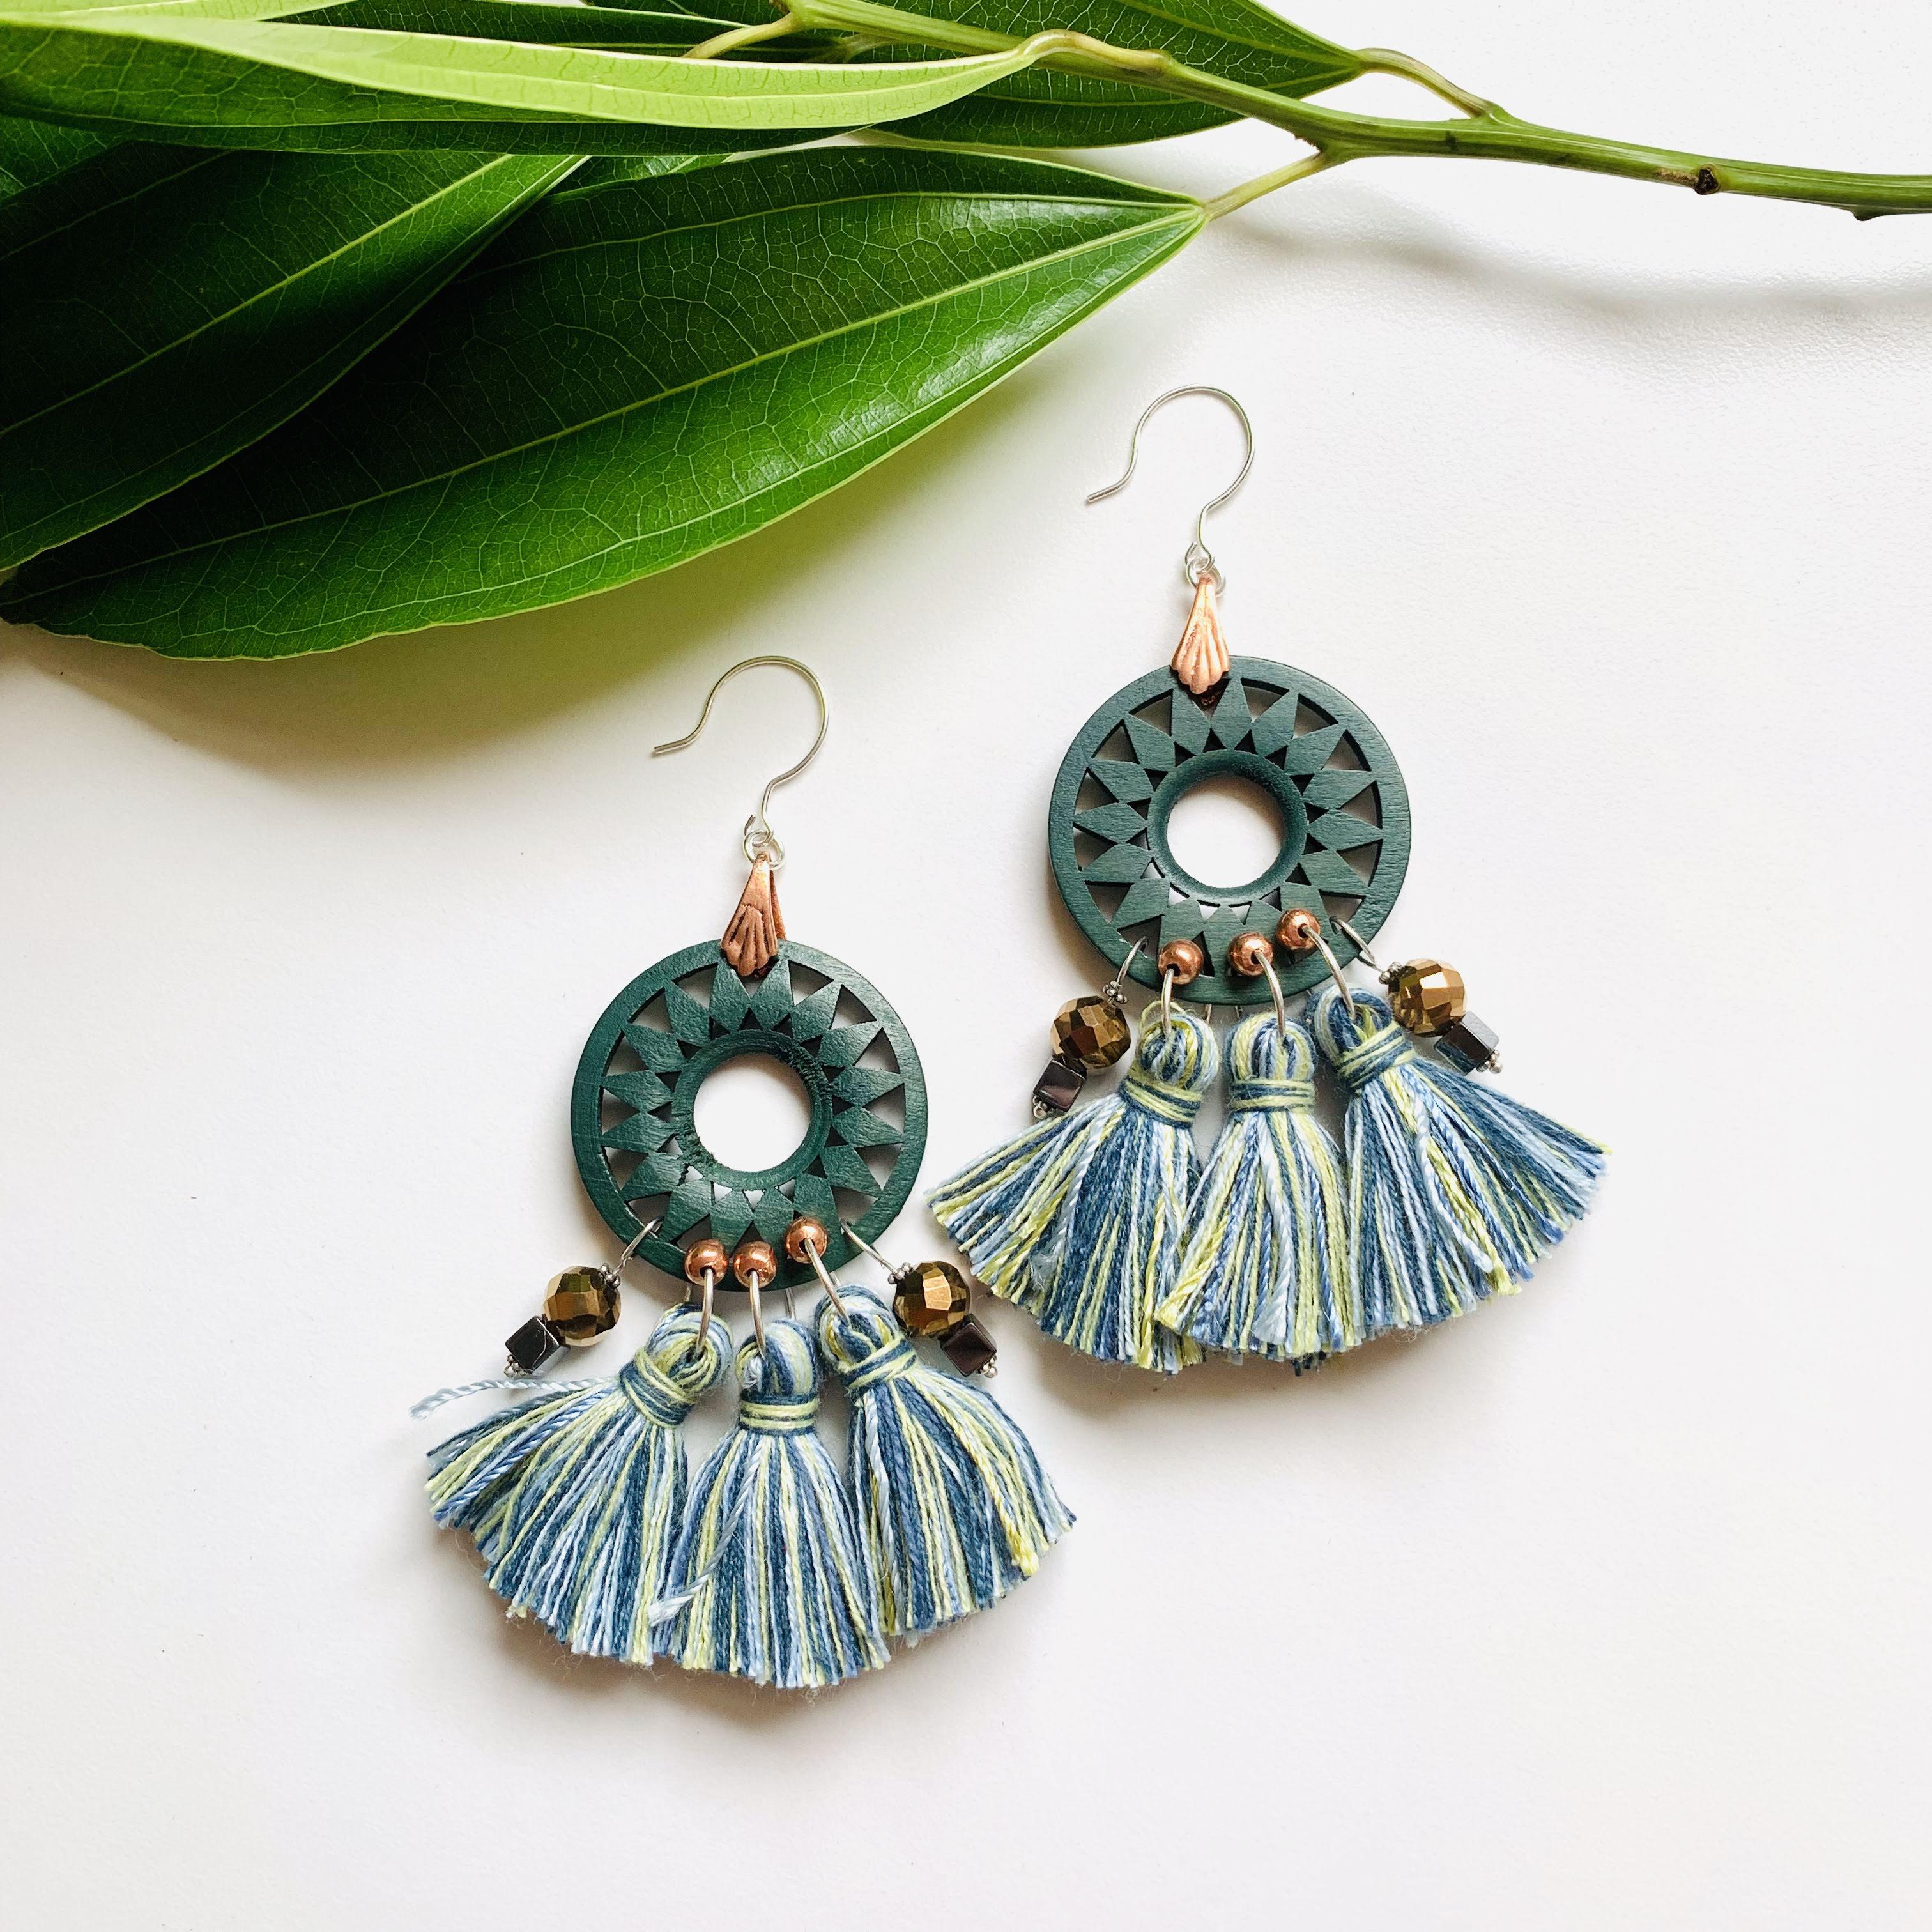 Forest Green Wooden Fringe Earrings